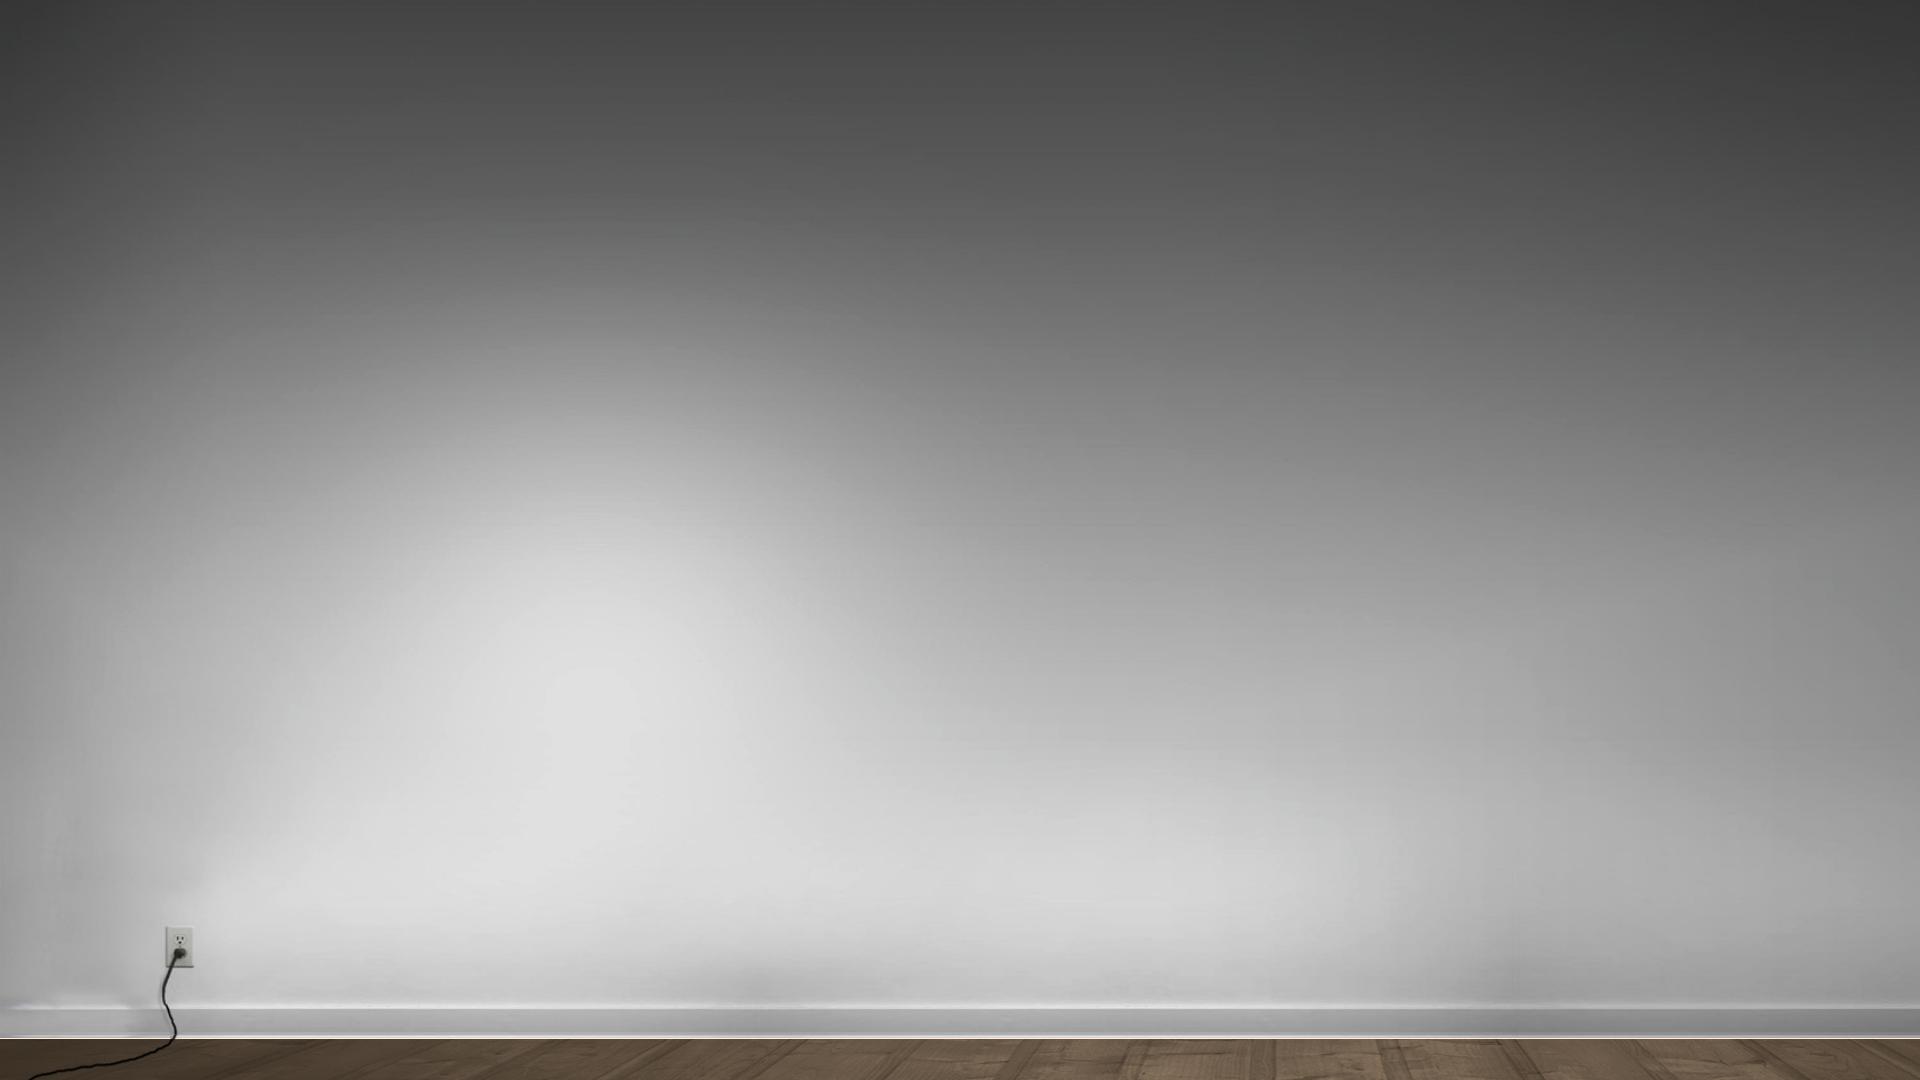 Tags wallapapers imagenes MUY BUENOS minimalist 1920x1080